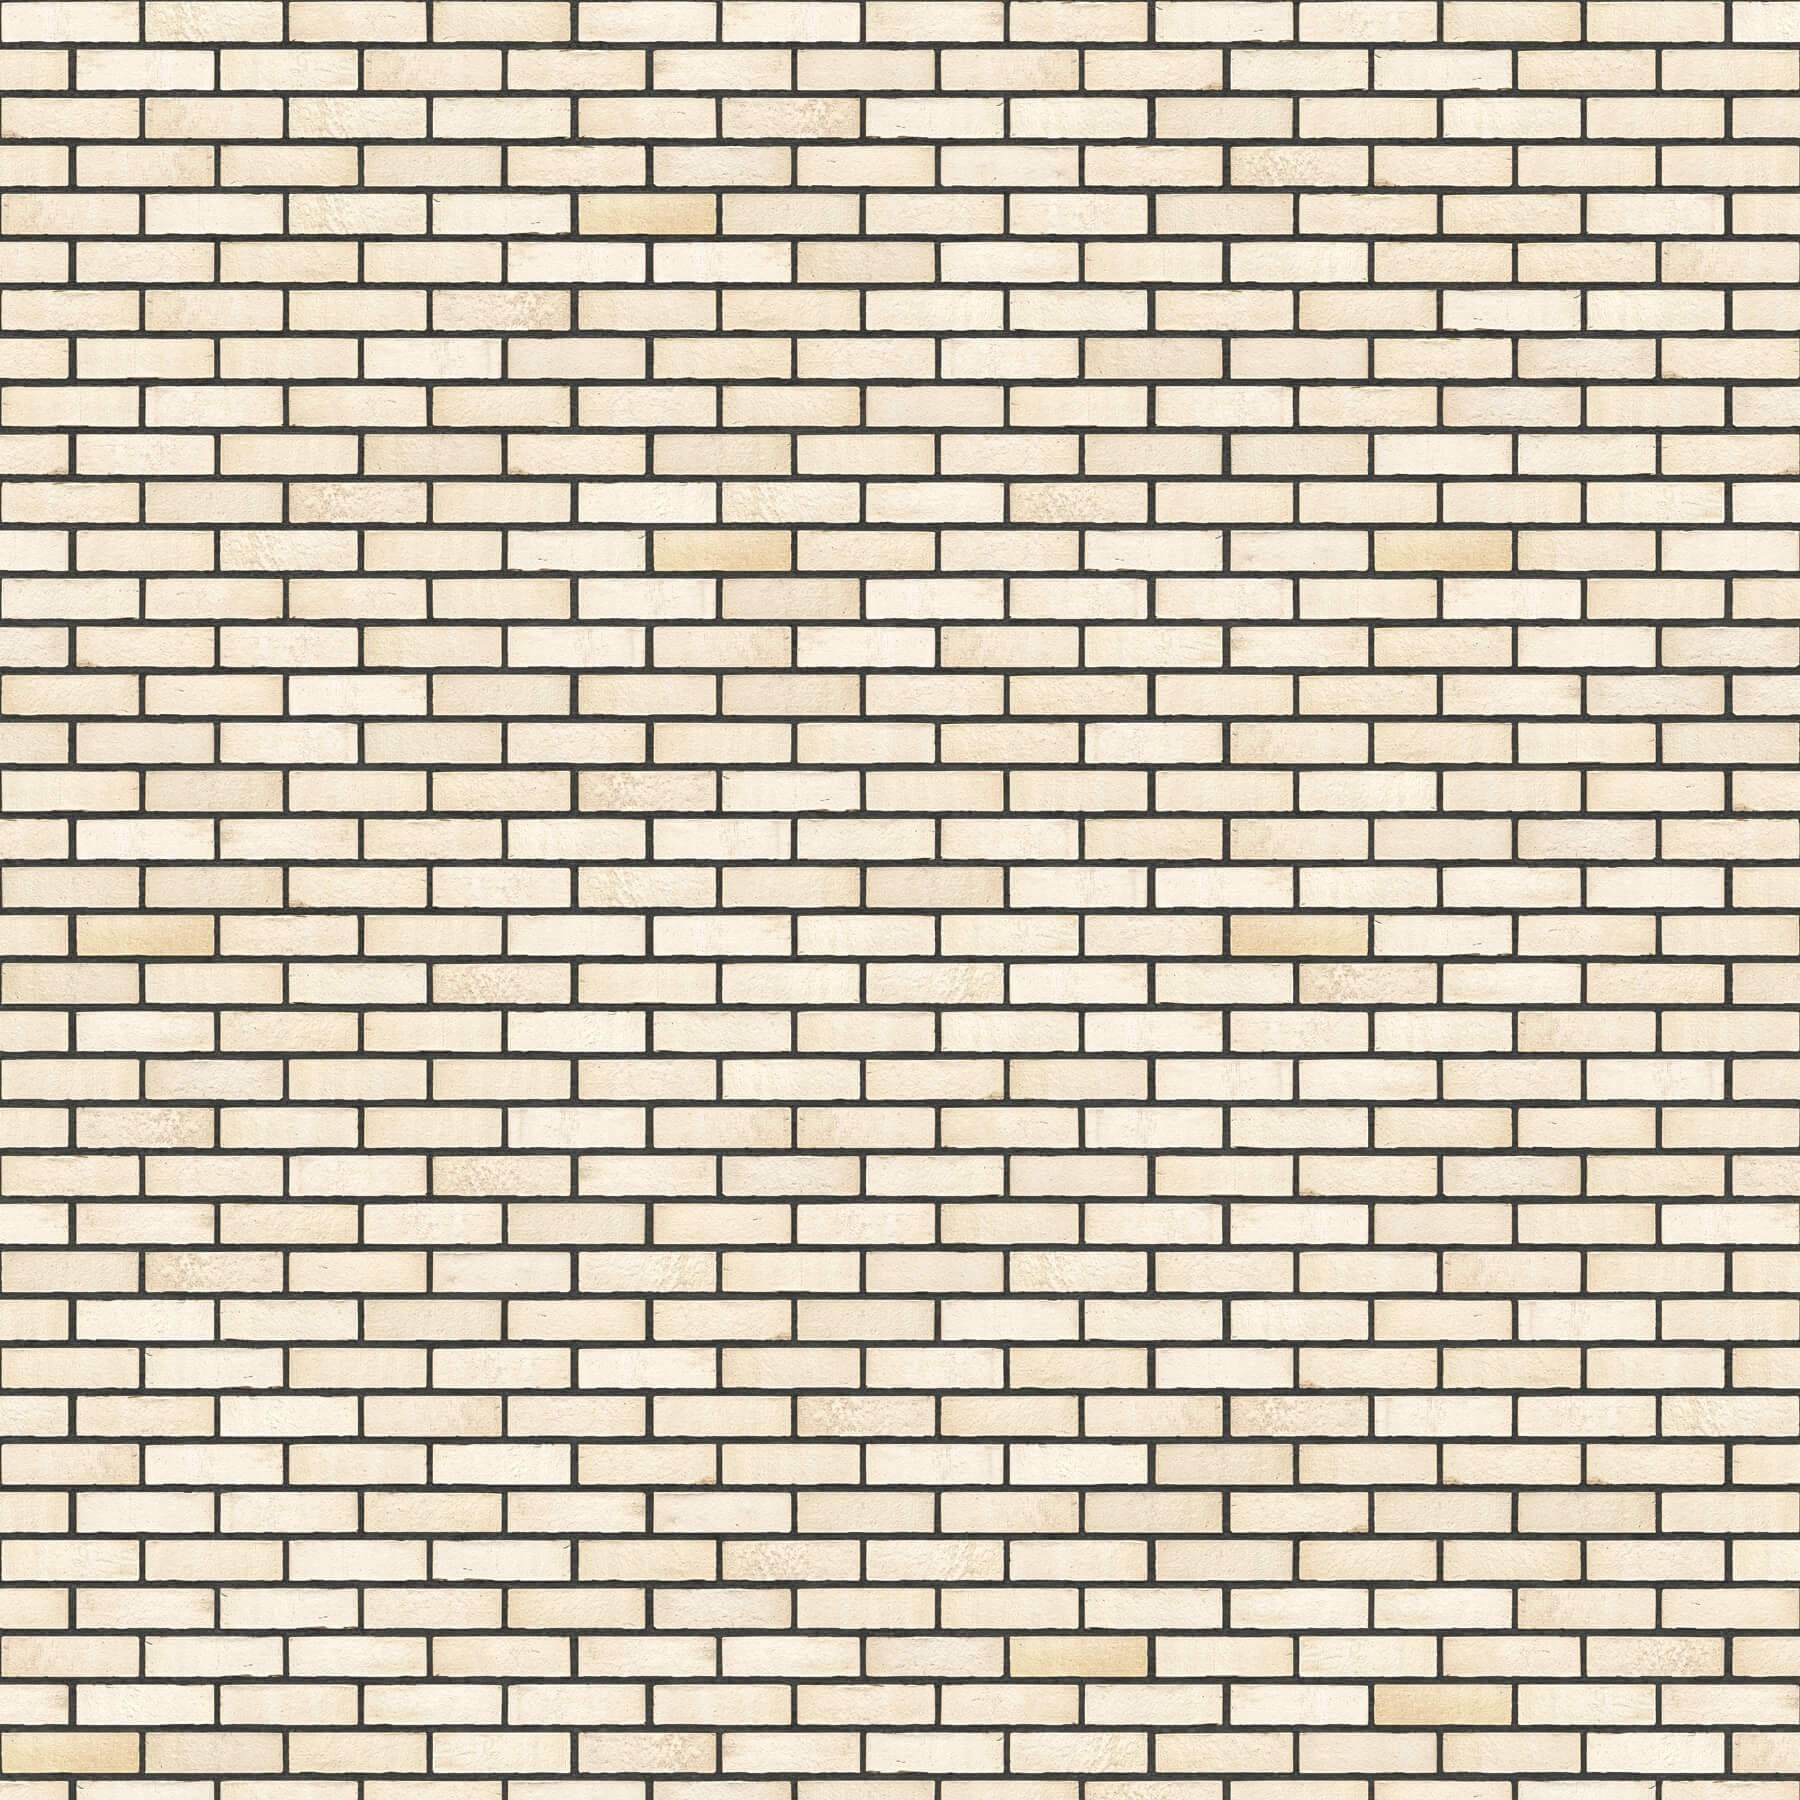 Puna-cigla-FeldHaus-Klinker-brick-house-beograd-nf-k-911-Antracit Fuga